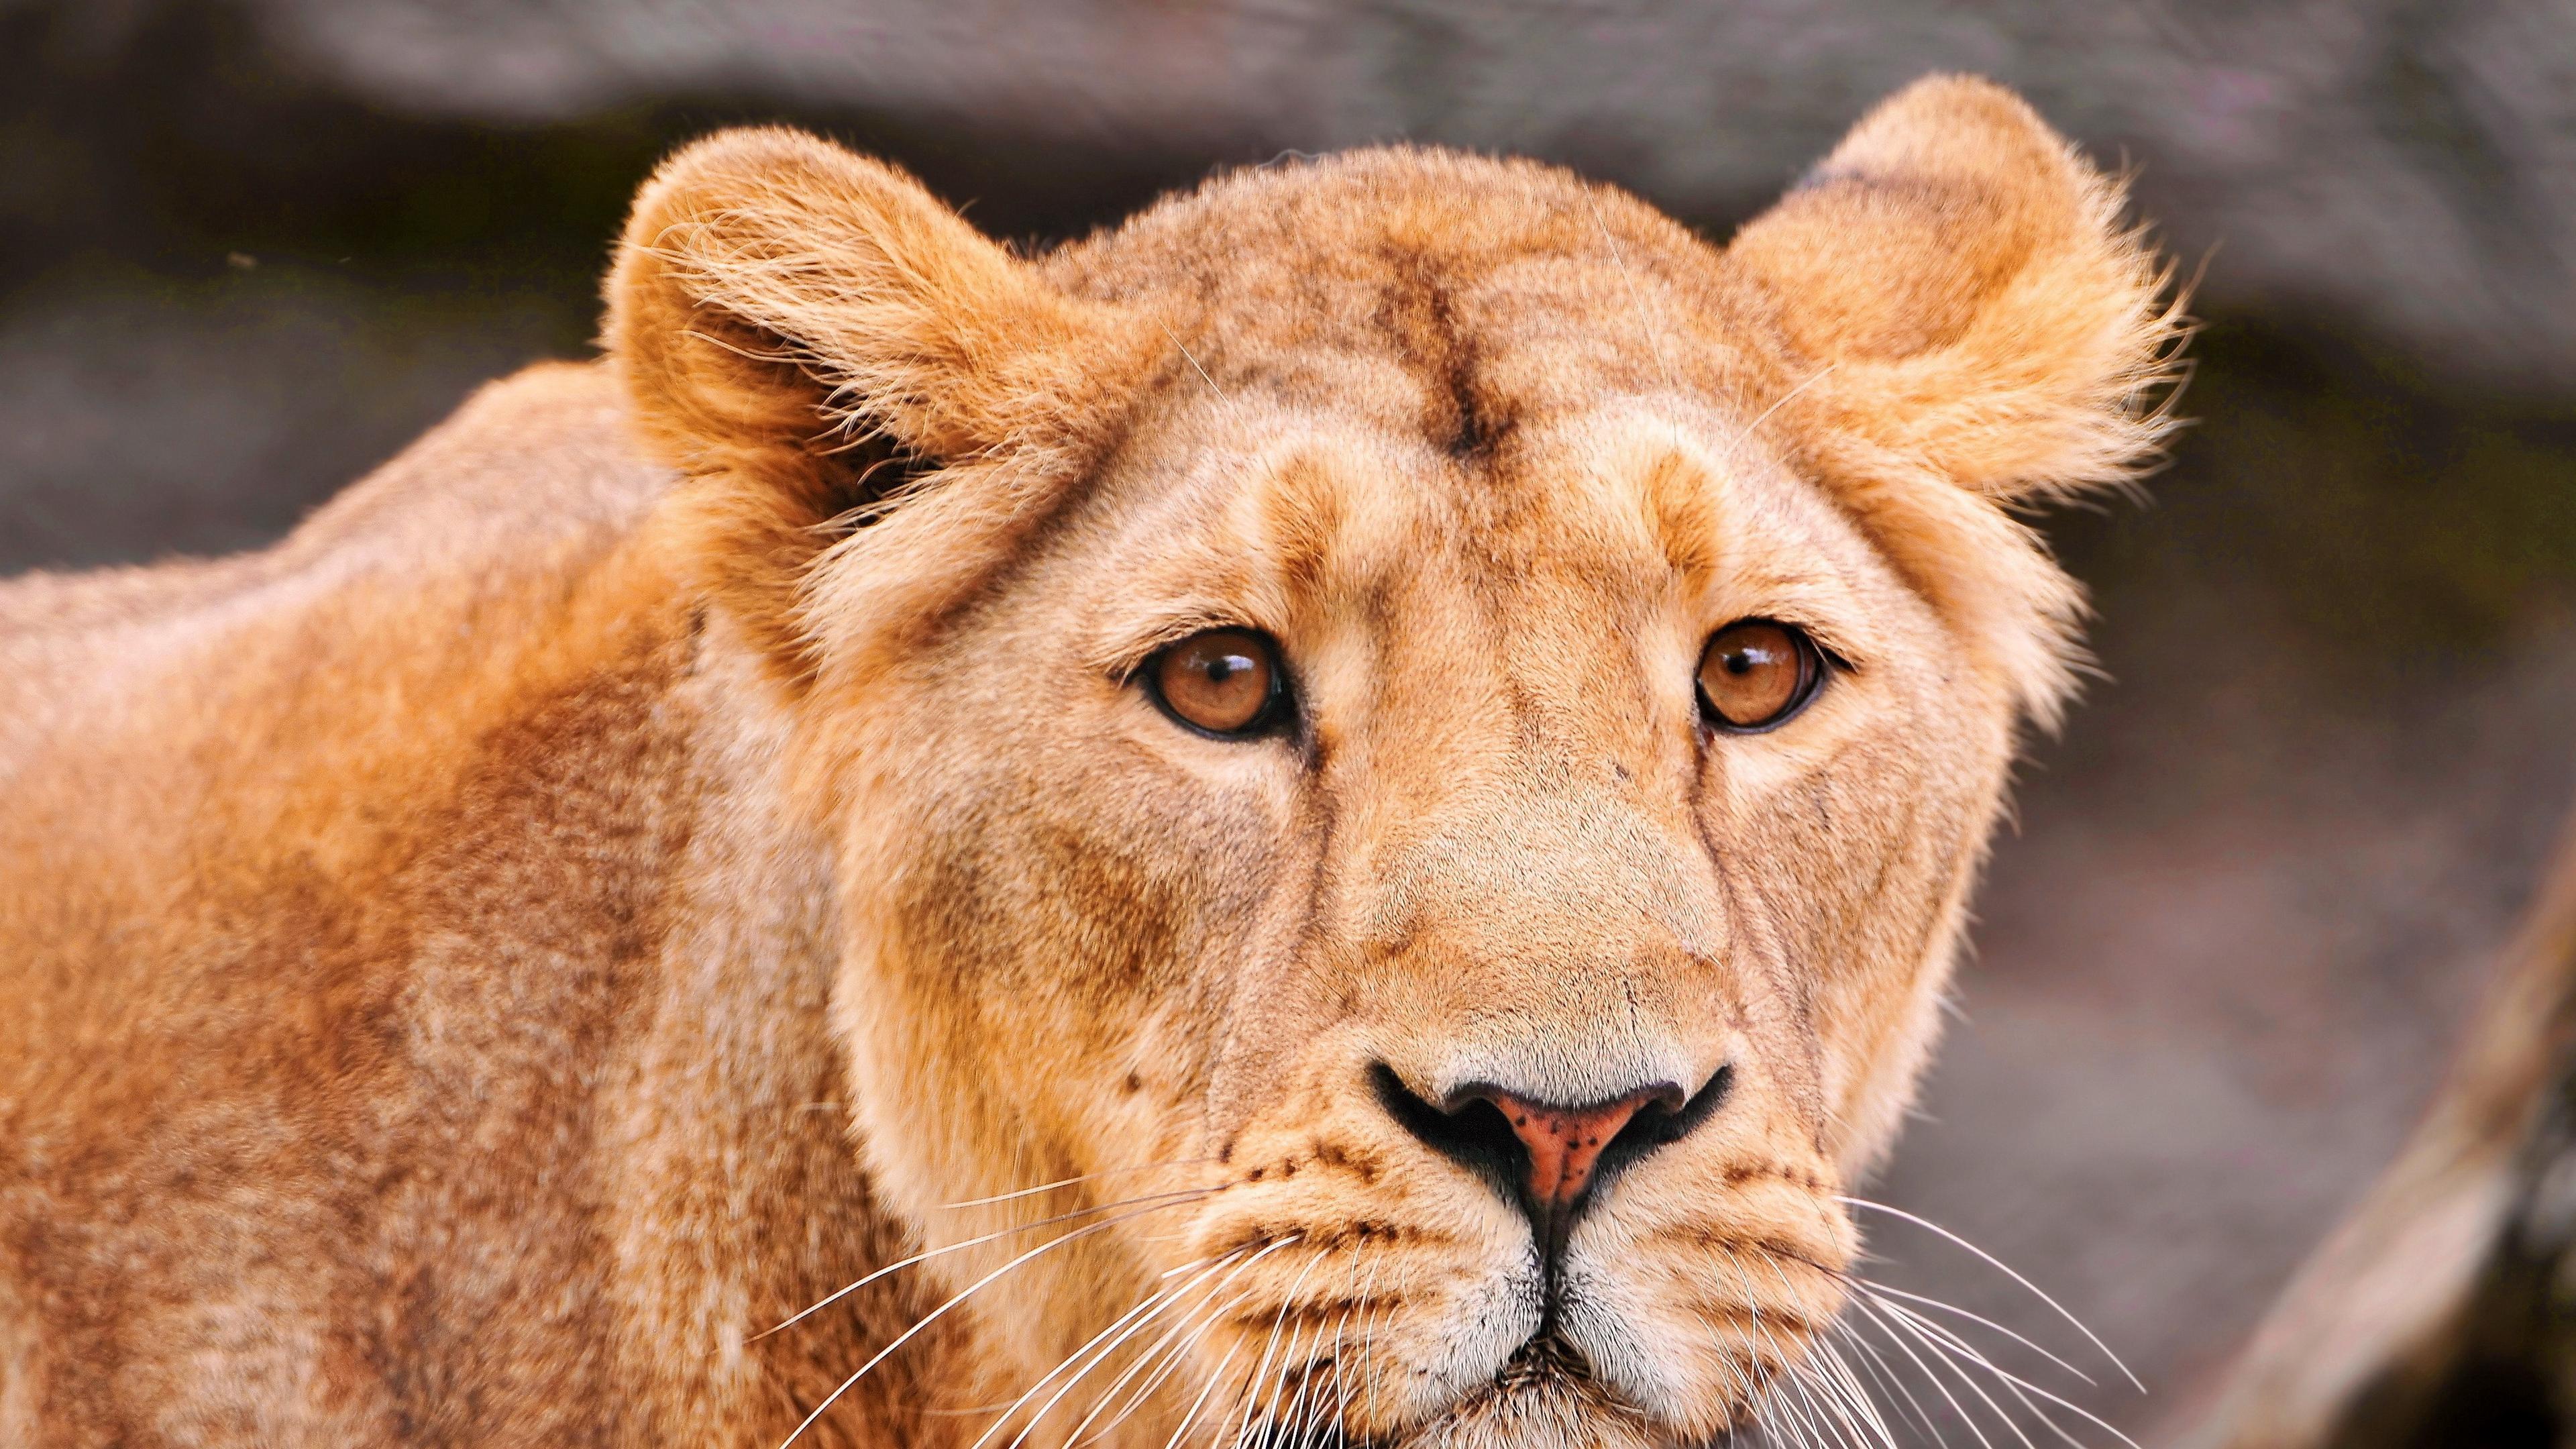 lion face predator big cat 4k 1542242649 - lion, face, predator, big cat 4k - Predator, Lion, Face